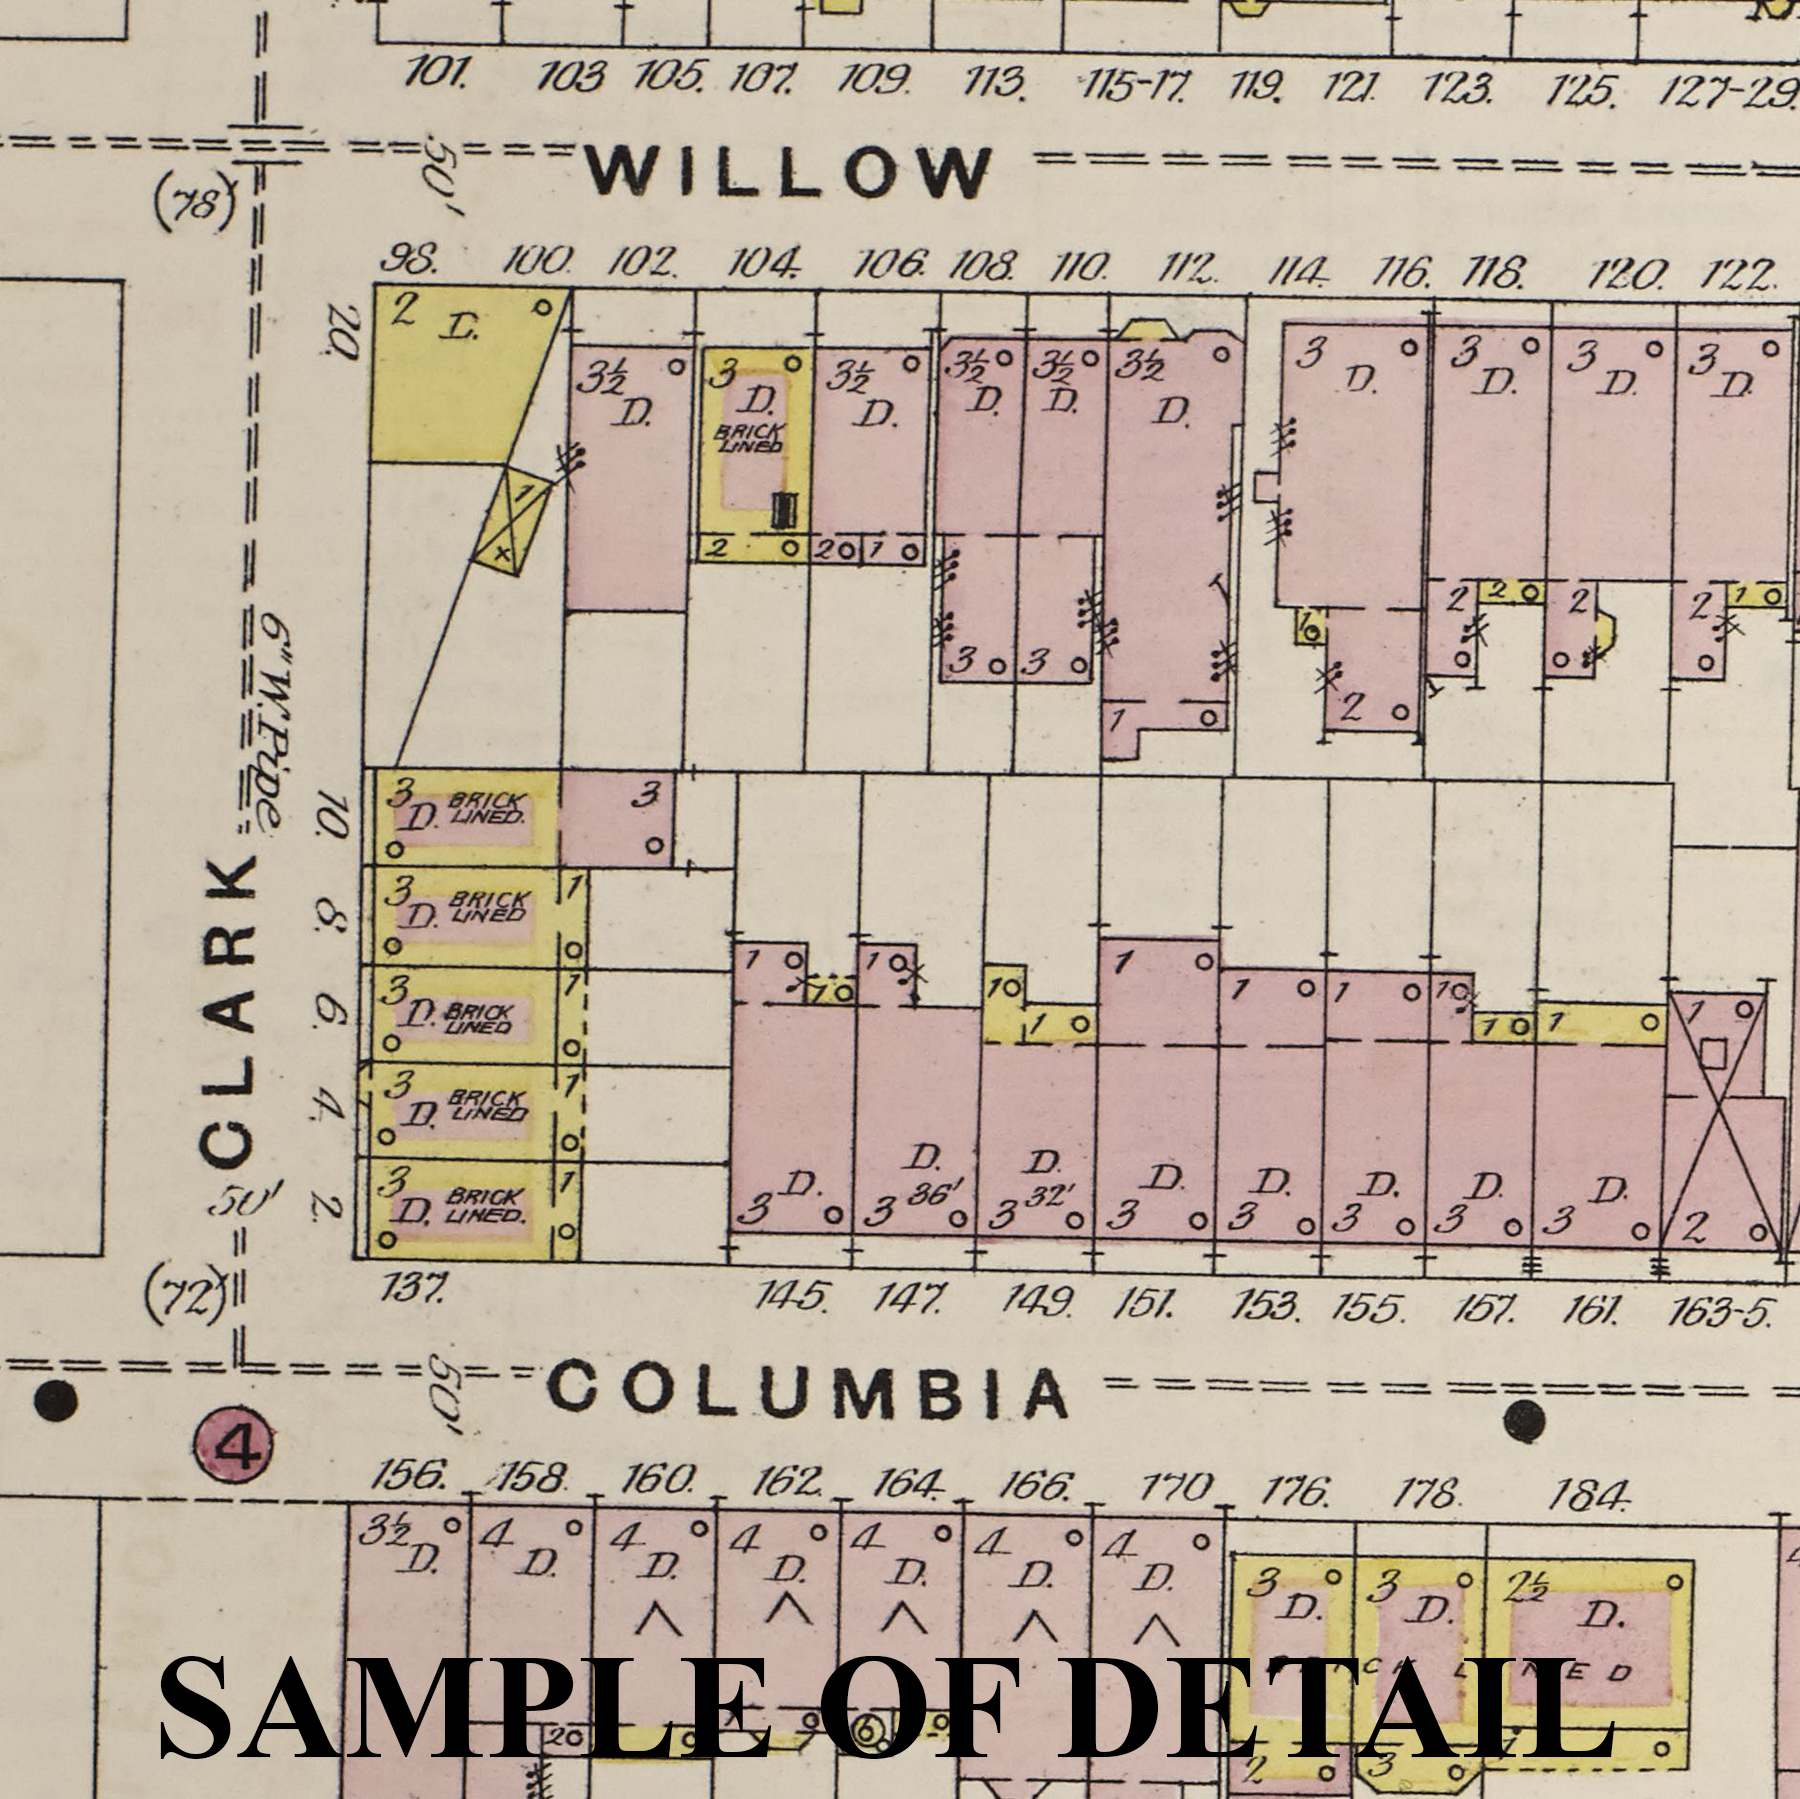 sample-05791-02-1887-0031l.jpg